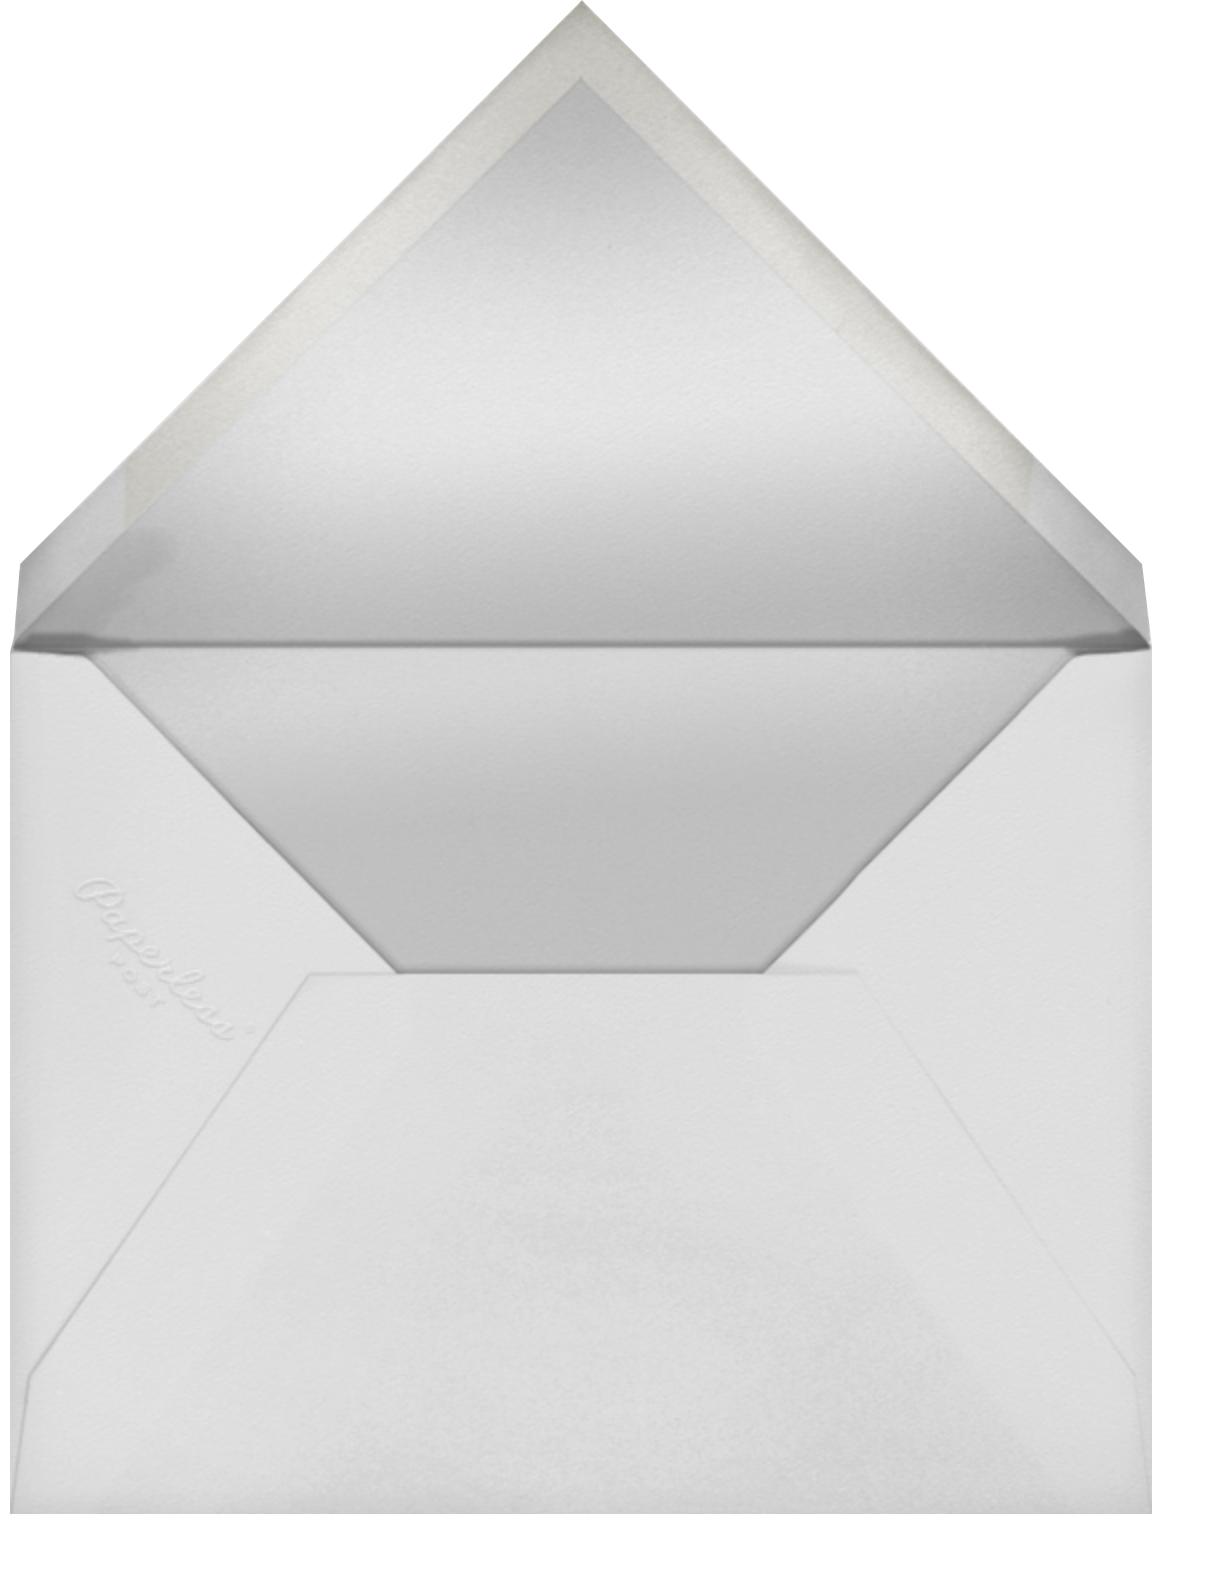 Choli (Program) - Indigo - Paperless Post - Envelope